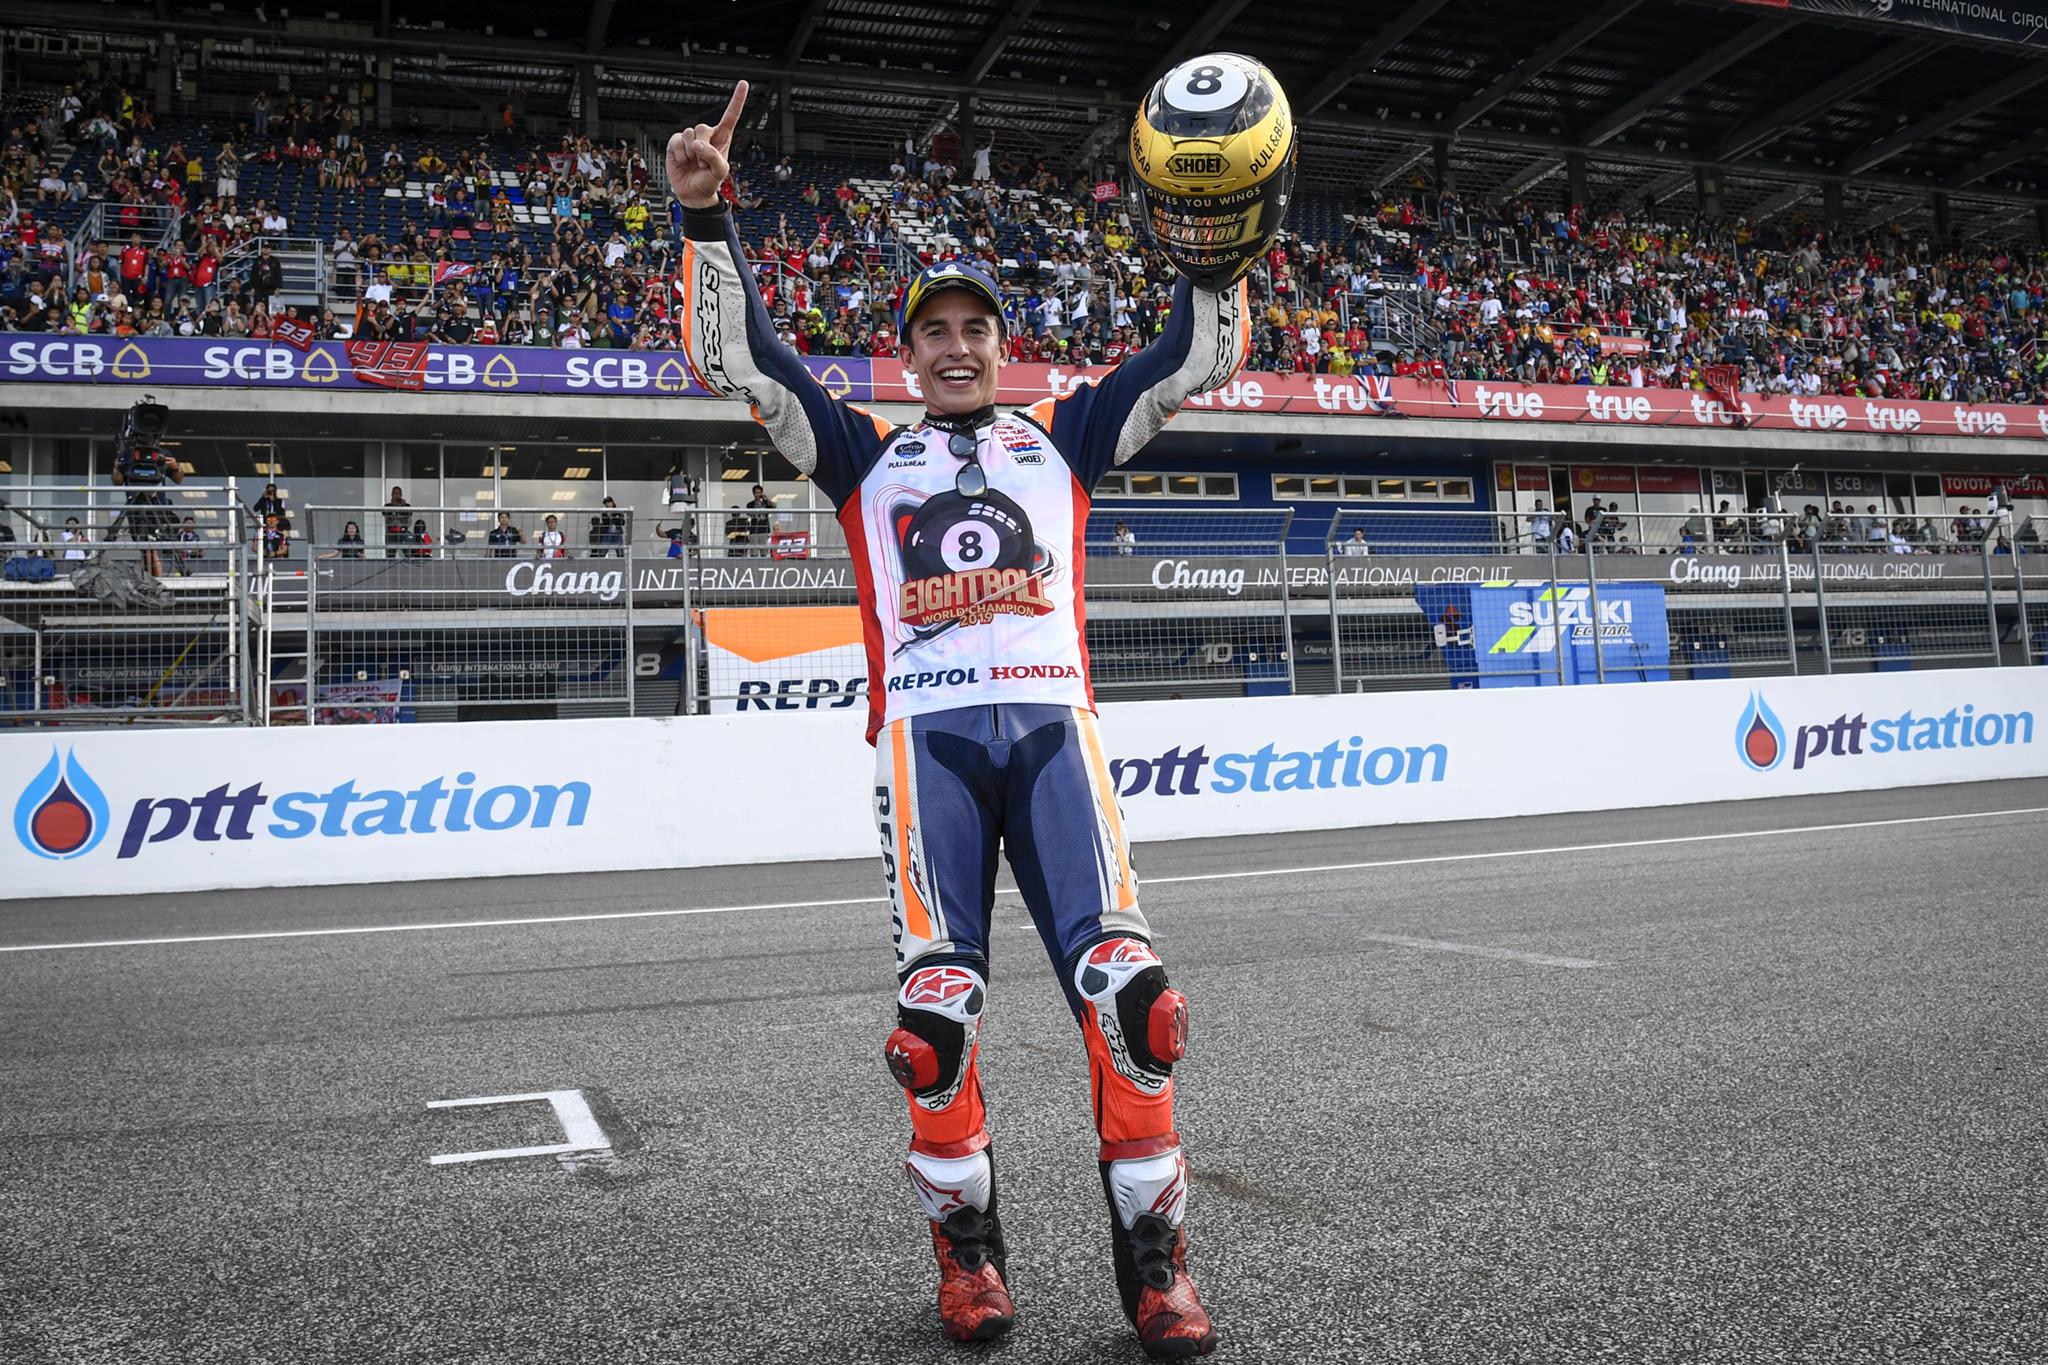 Image by MotoGP